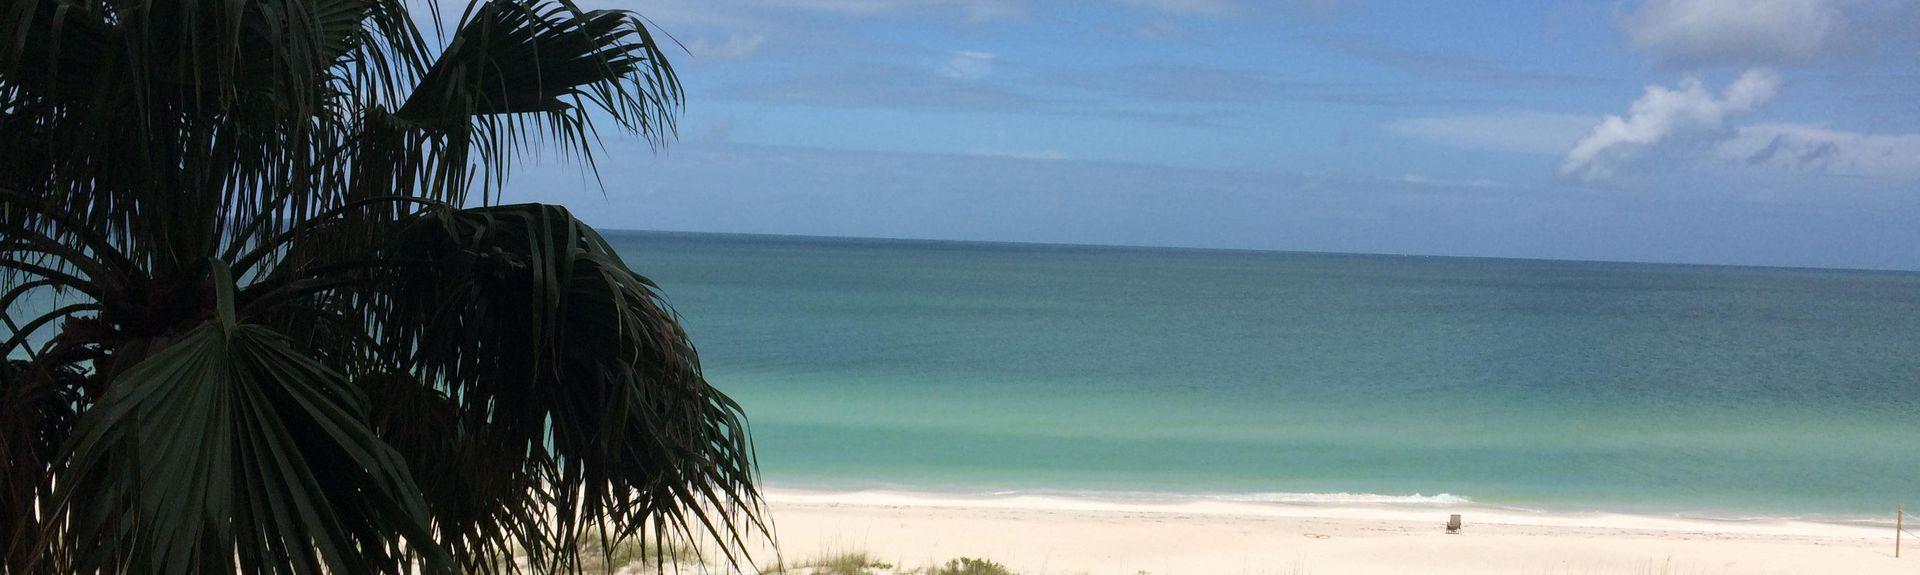 Regatta Beach Club, Clearwater Beach, Clearwater, FL, USA